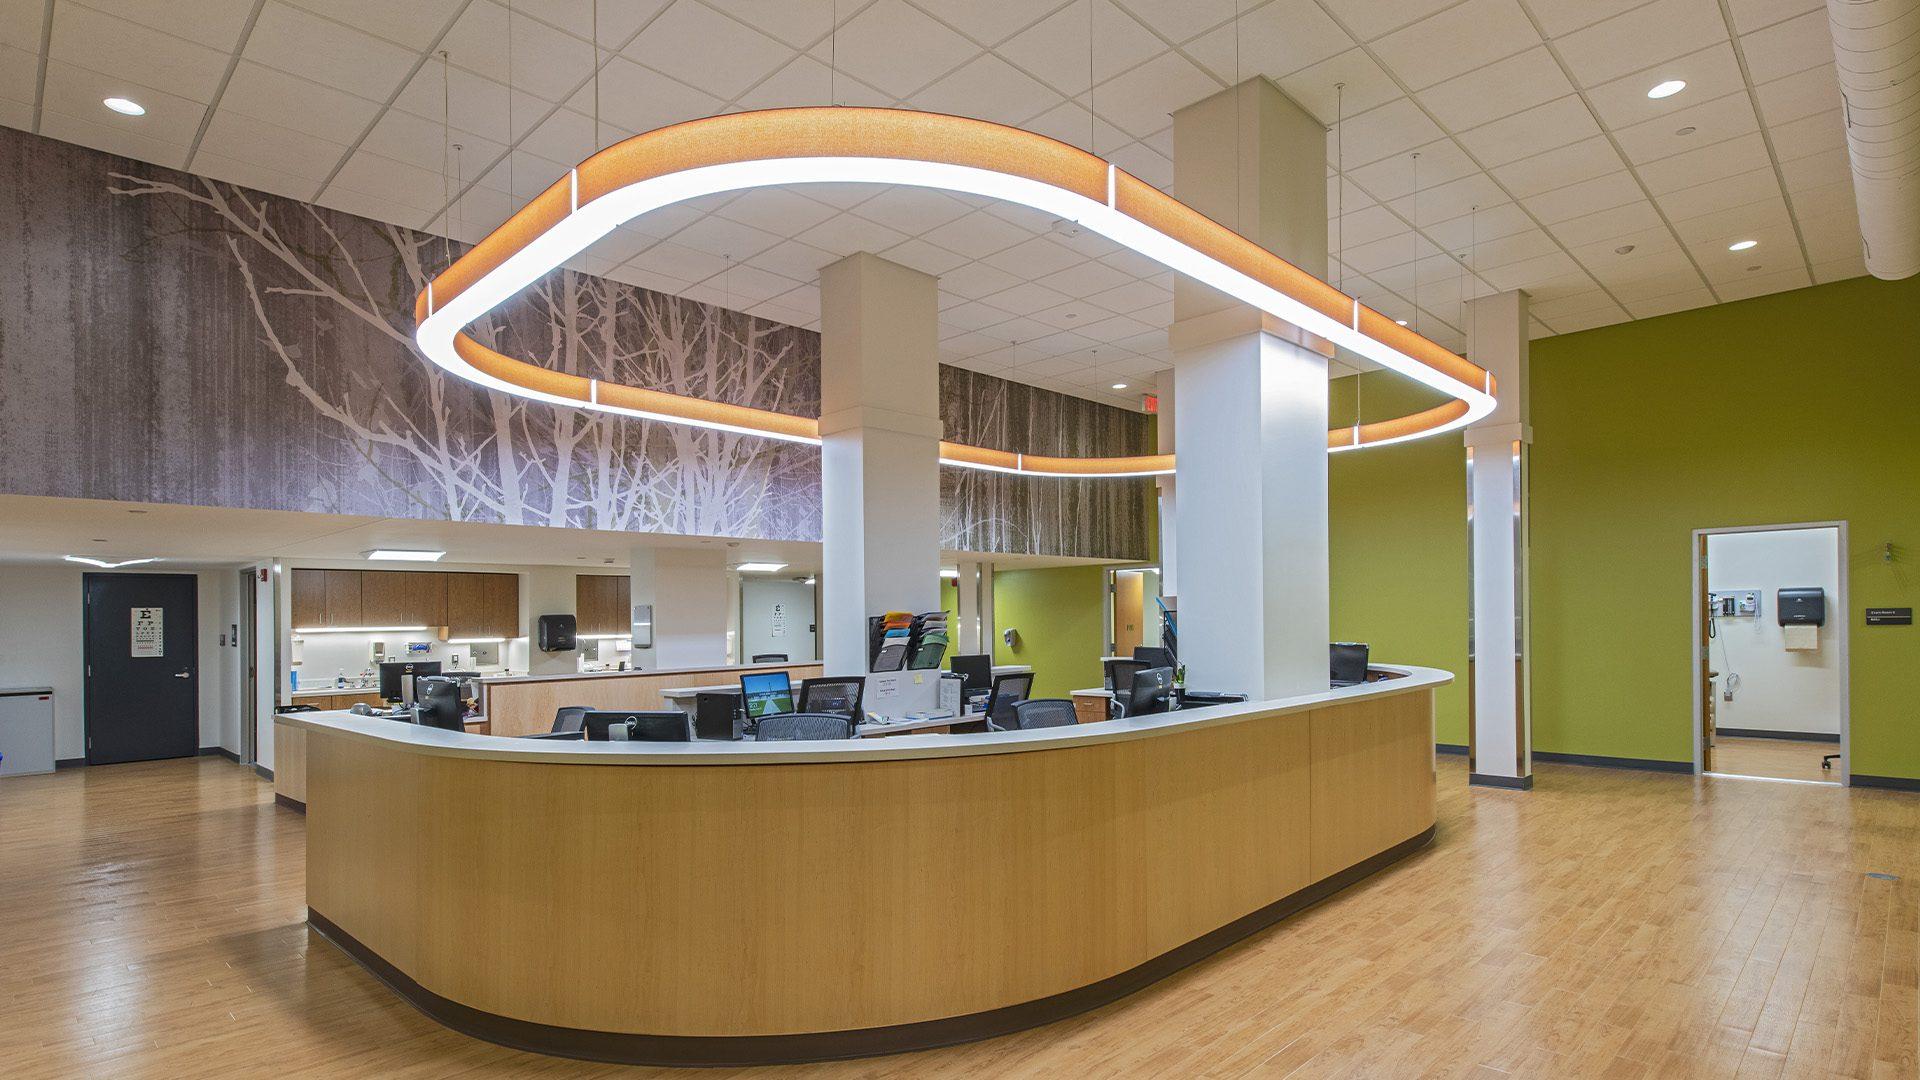 Residence Hall Health Center Int 1